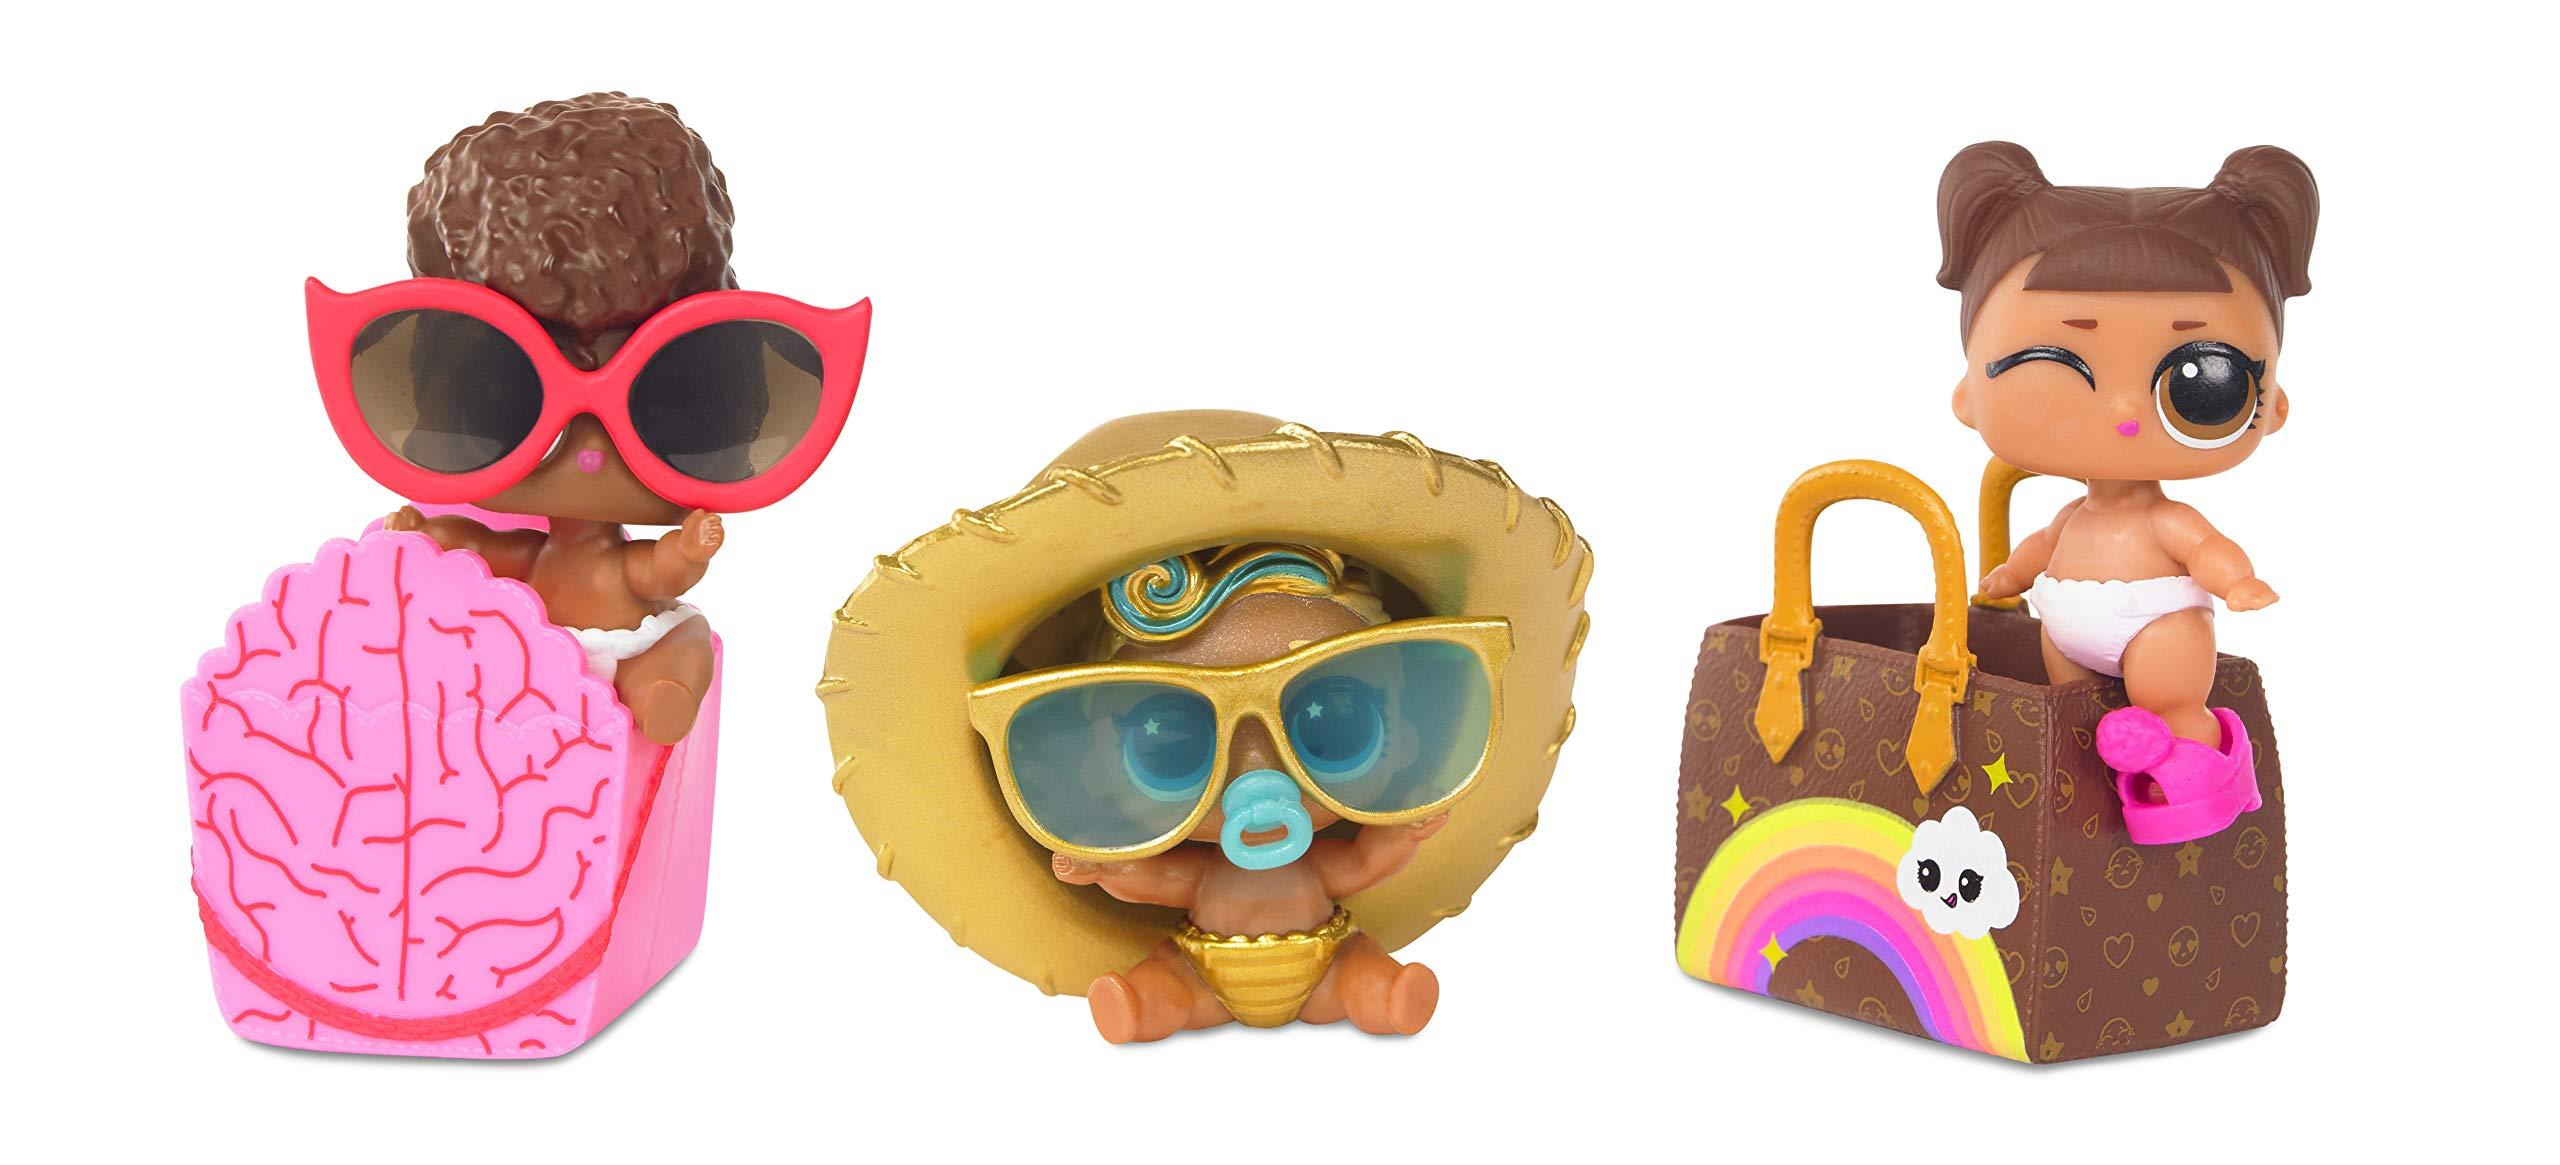 L.O.L. Surprise! Eye Spy Lil Sisters Doll Series 4-1(3 Pack)